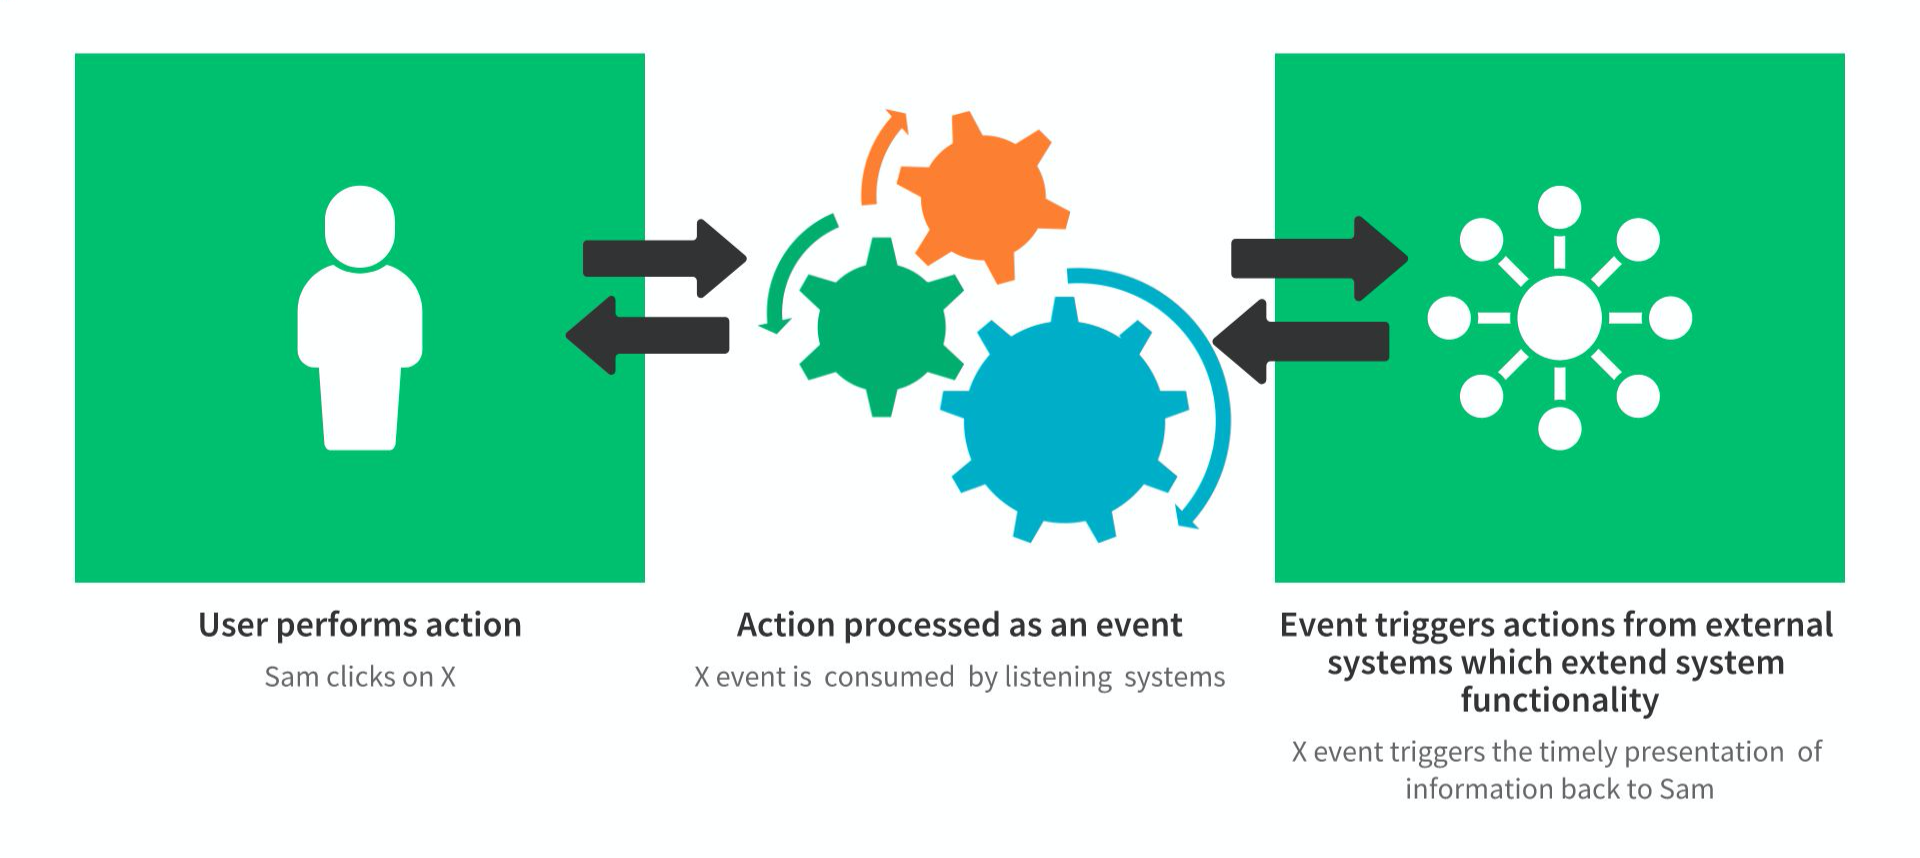 Event-Driven Architecture (EDA) helps promote event-driven user communication